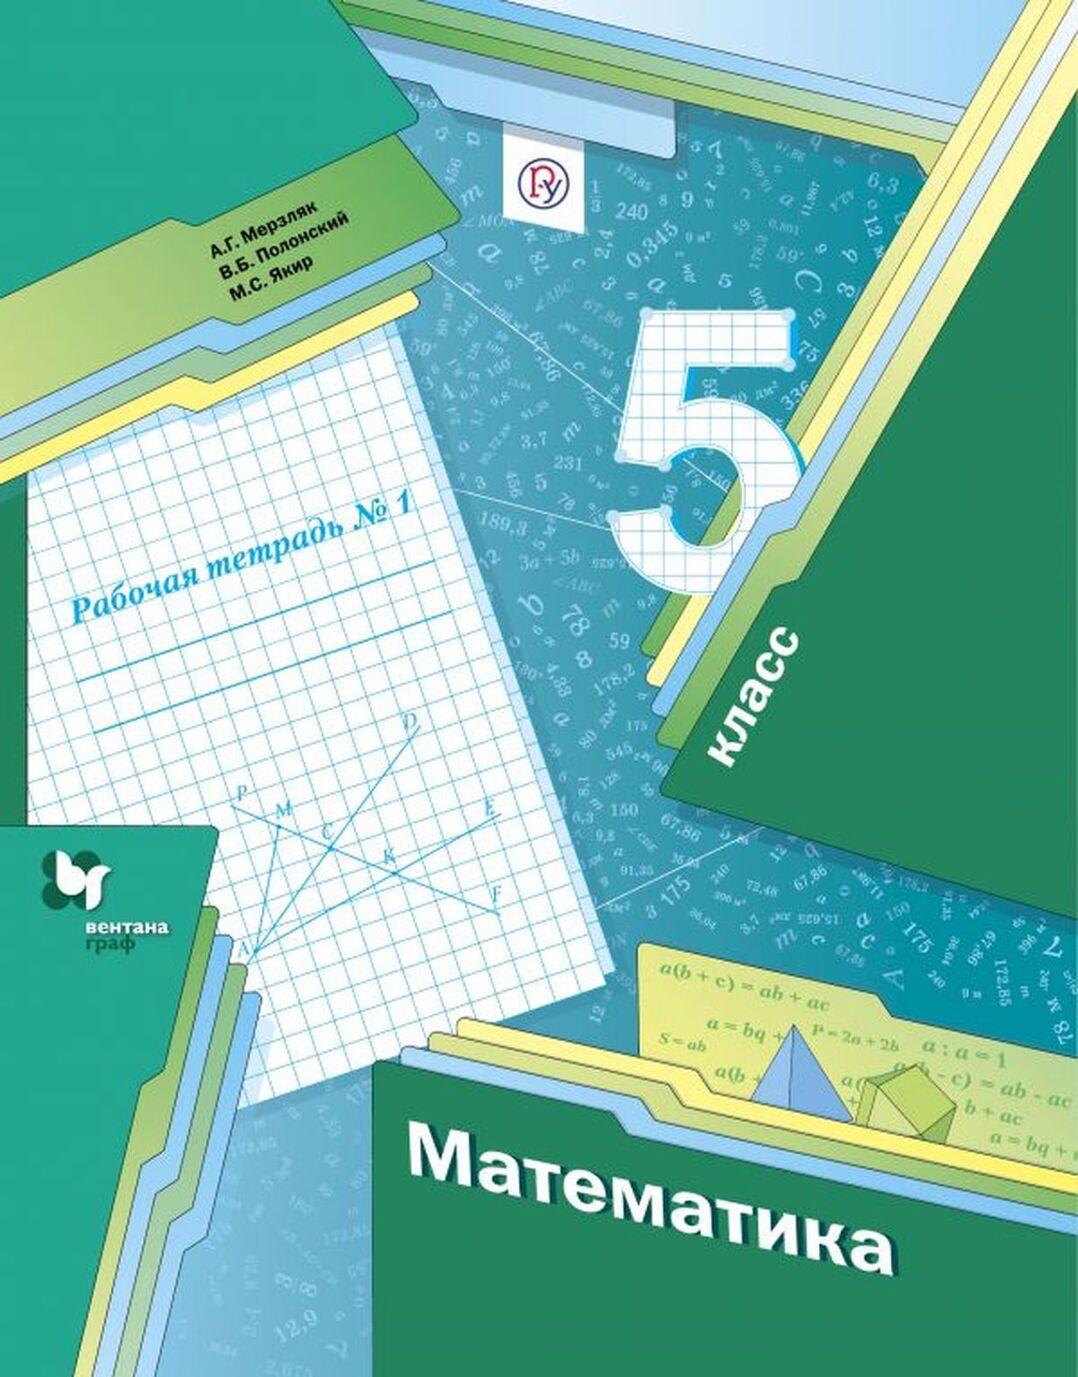 Matematika. 5klass. Rabochaja tetrad. V 2-kh chastjakh. Chast 1  | Jakir Mikhail Semenovich, Polonskij Vitalij Borisovich